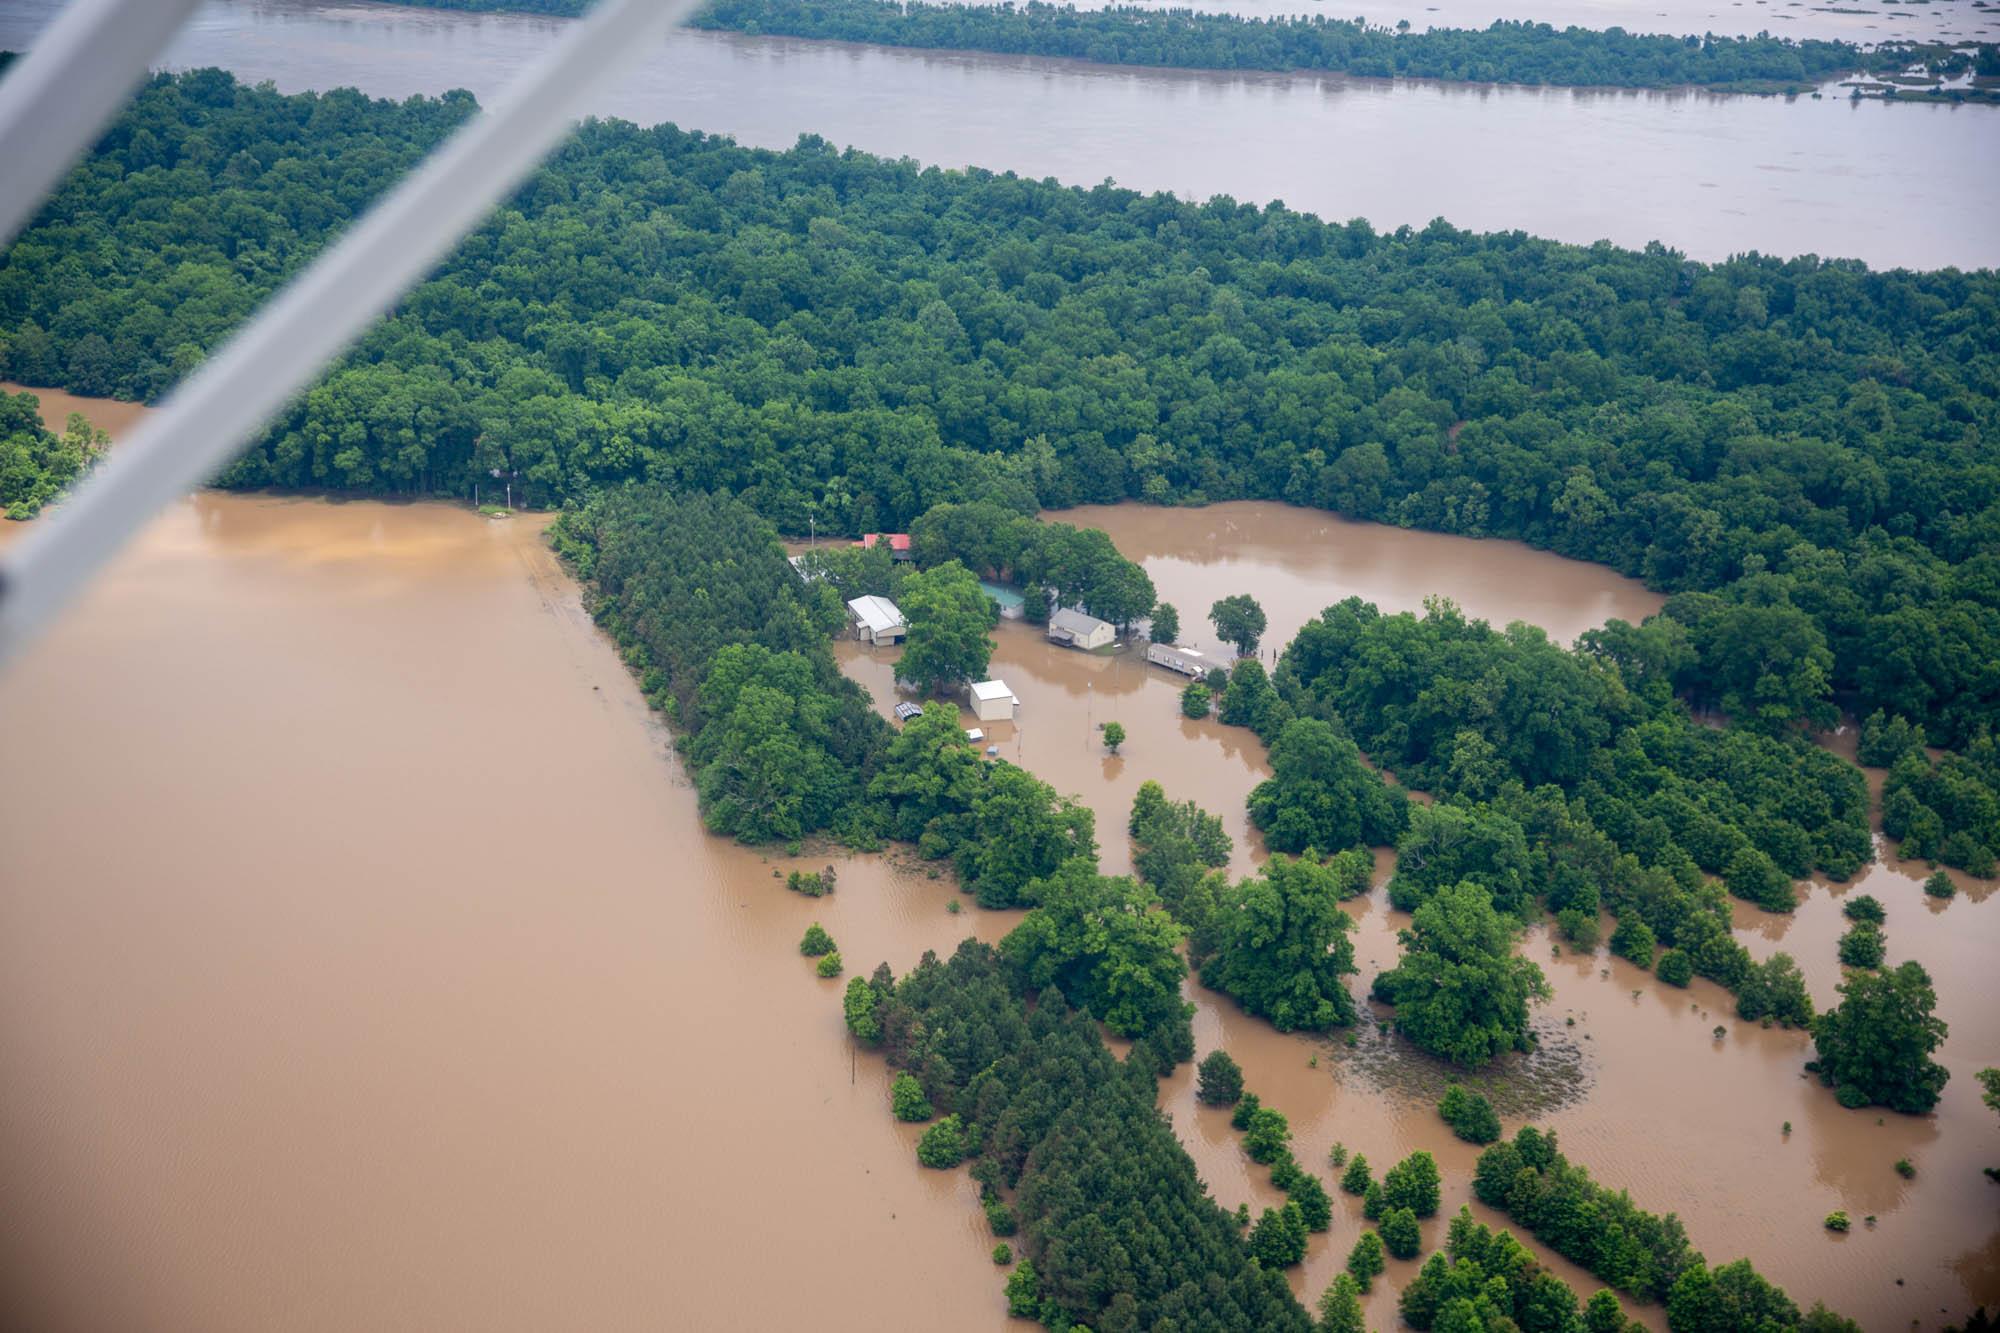 arkansas-river-flood-from-above